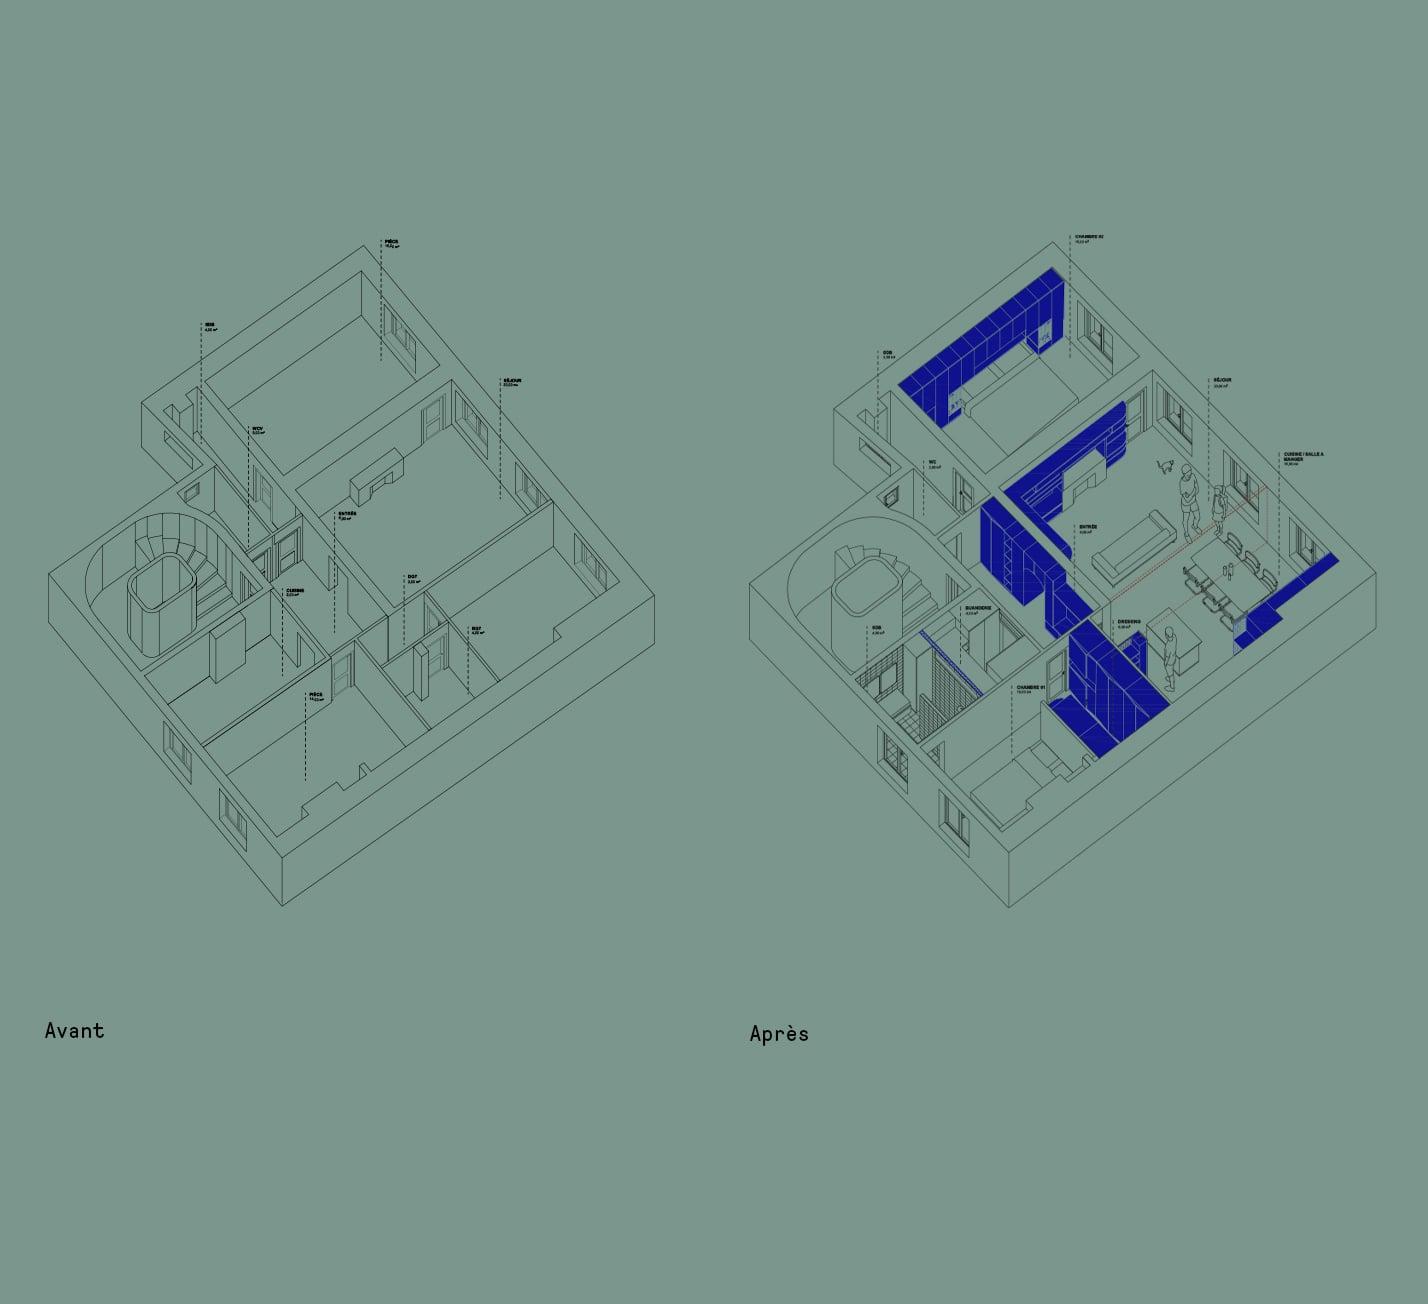 Projet-Jules-Cesar-Atelier-Steve-Pauline-Borgia-Architecte-Axo-01-min